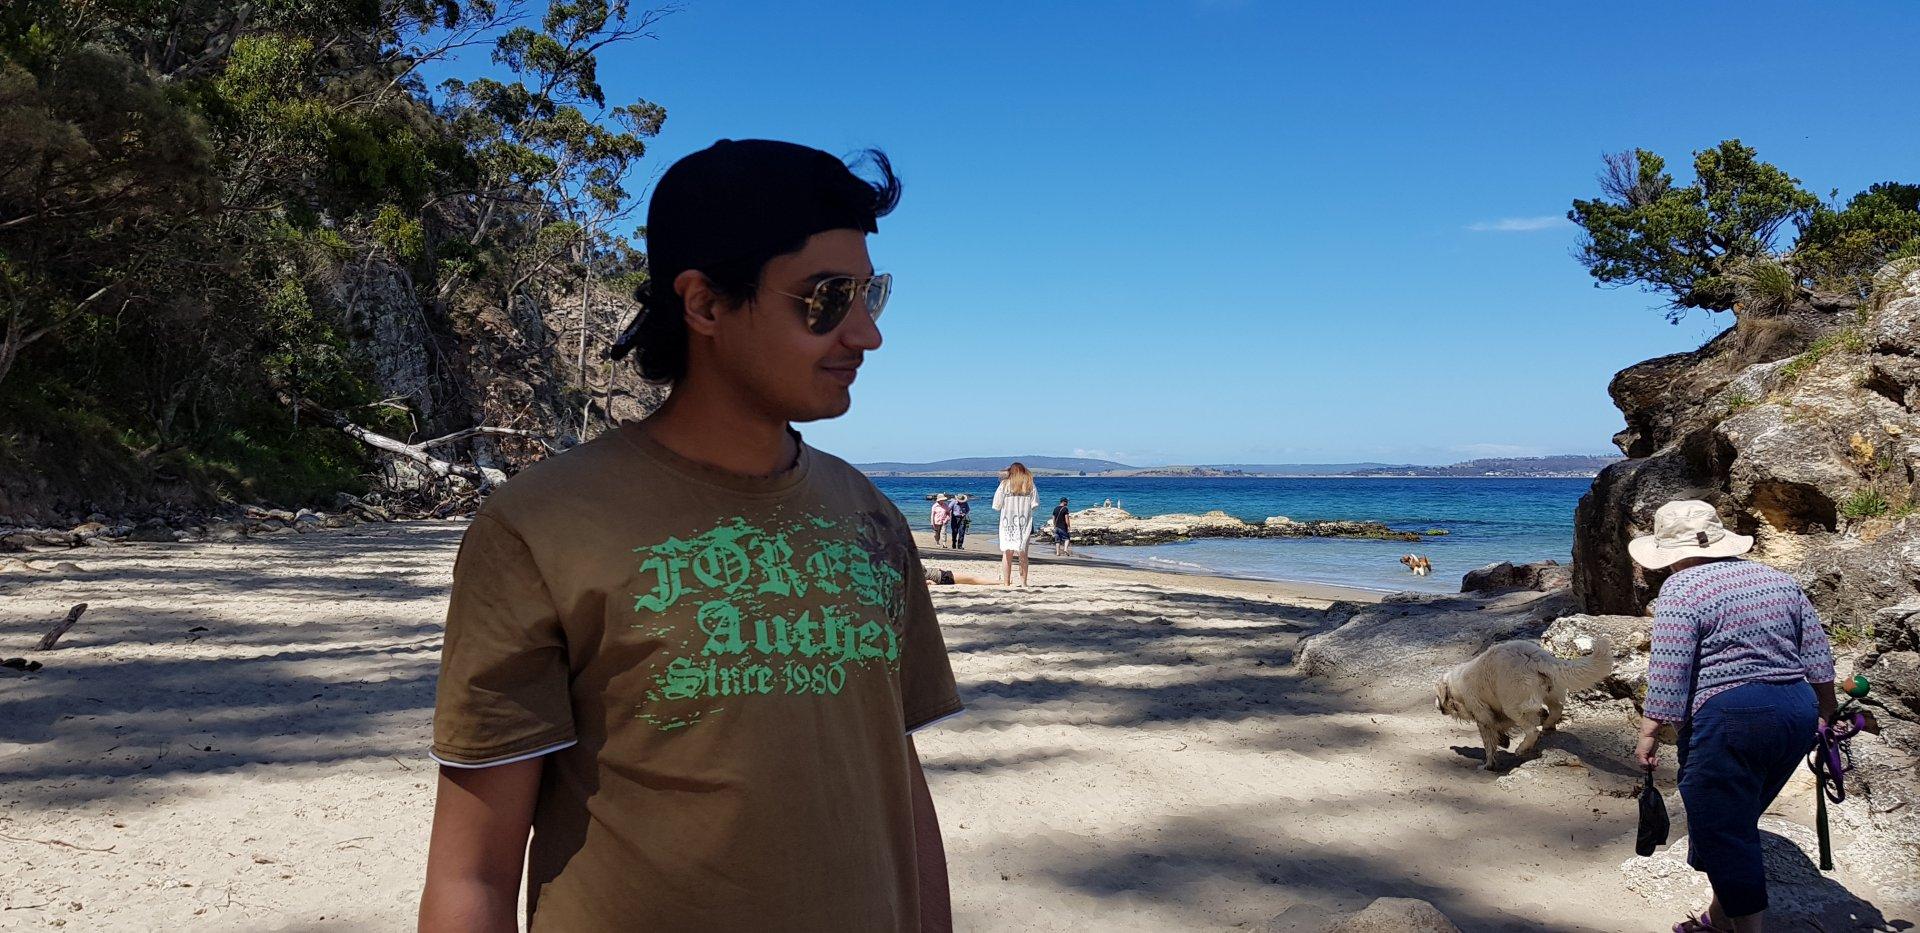 420kinkster from Queensland,Australia